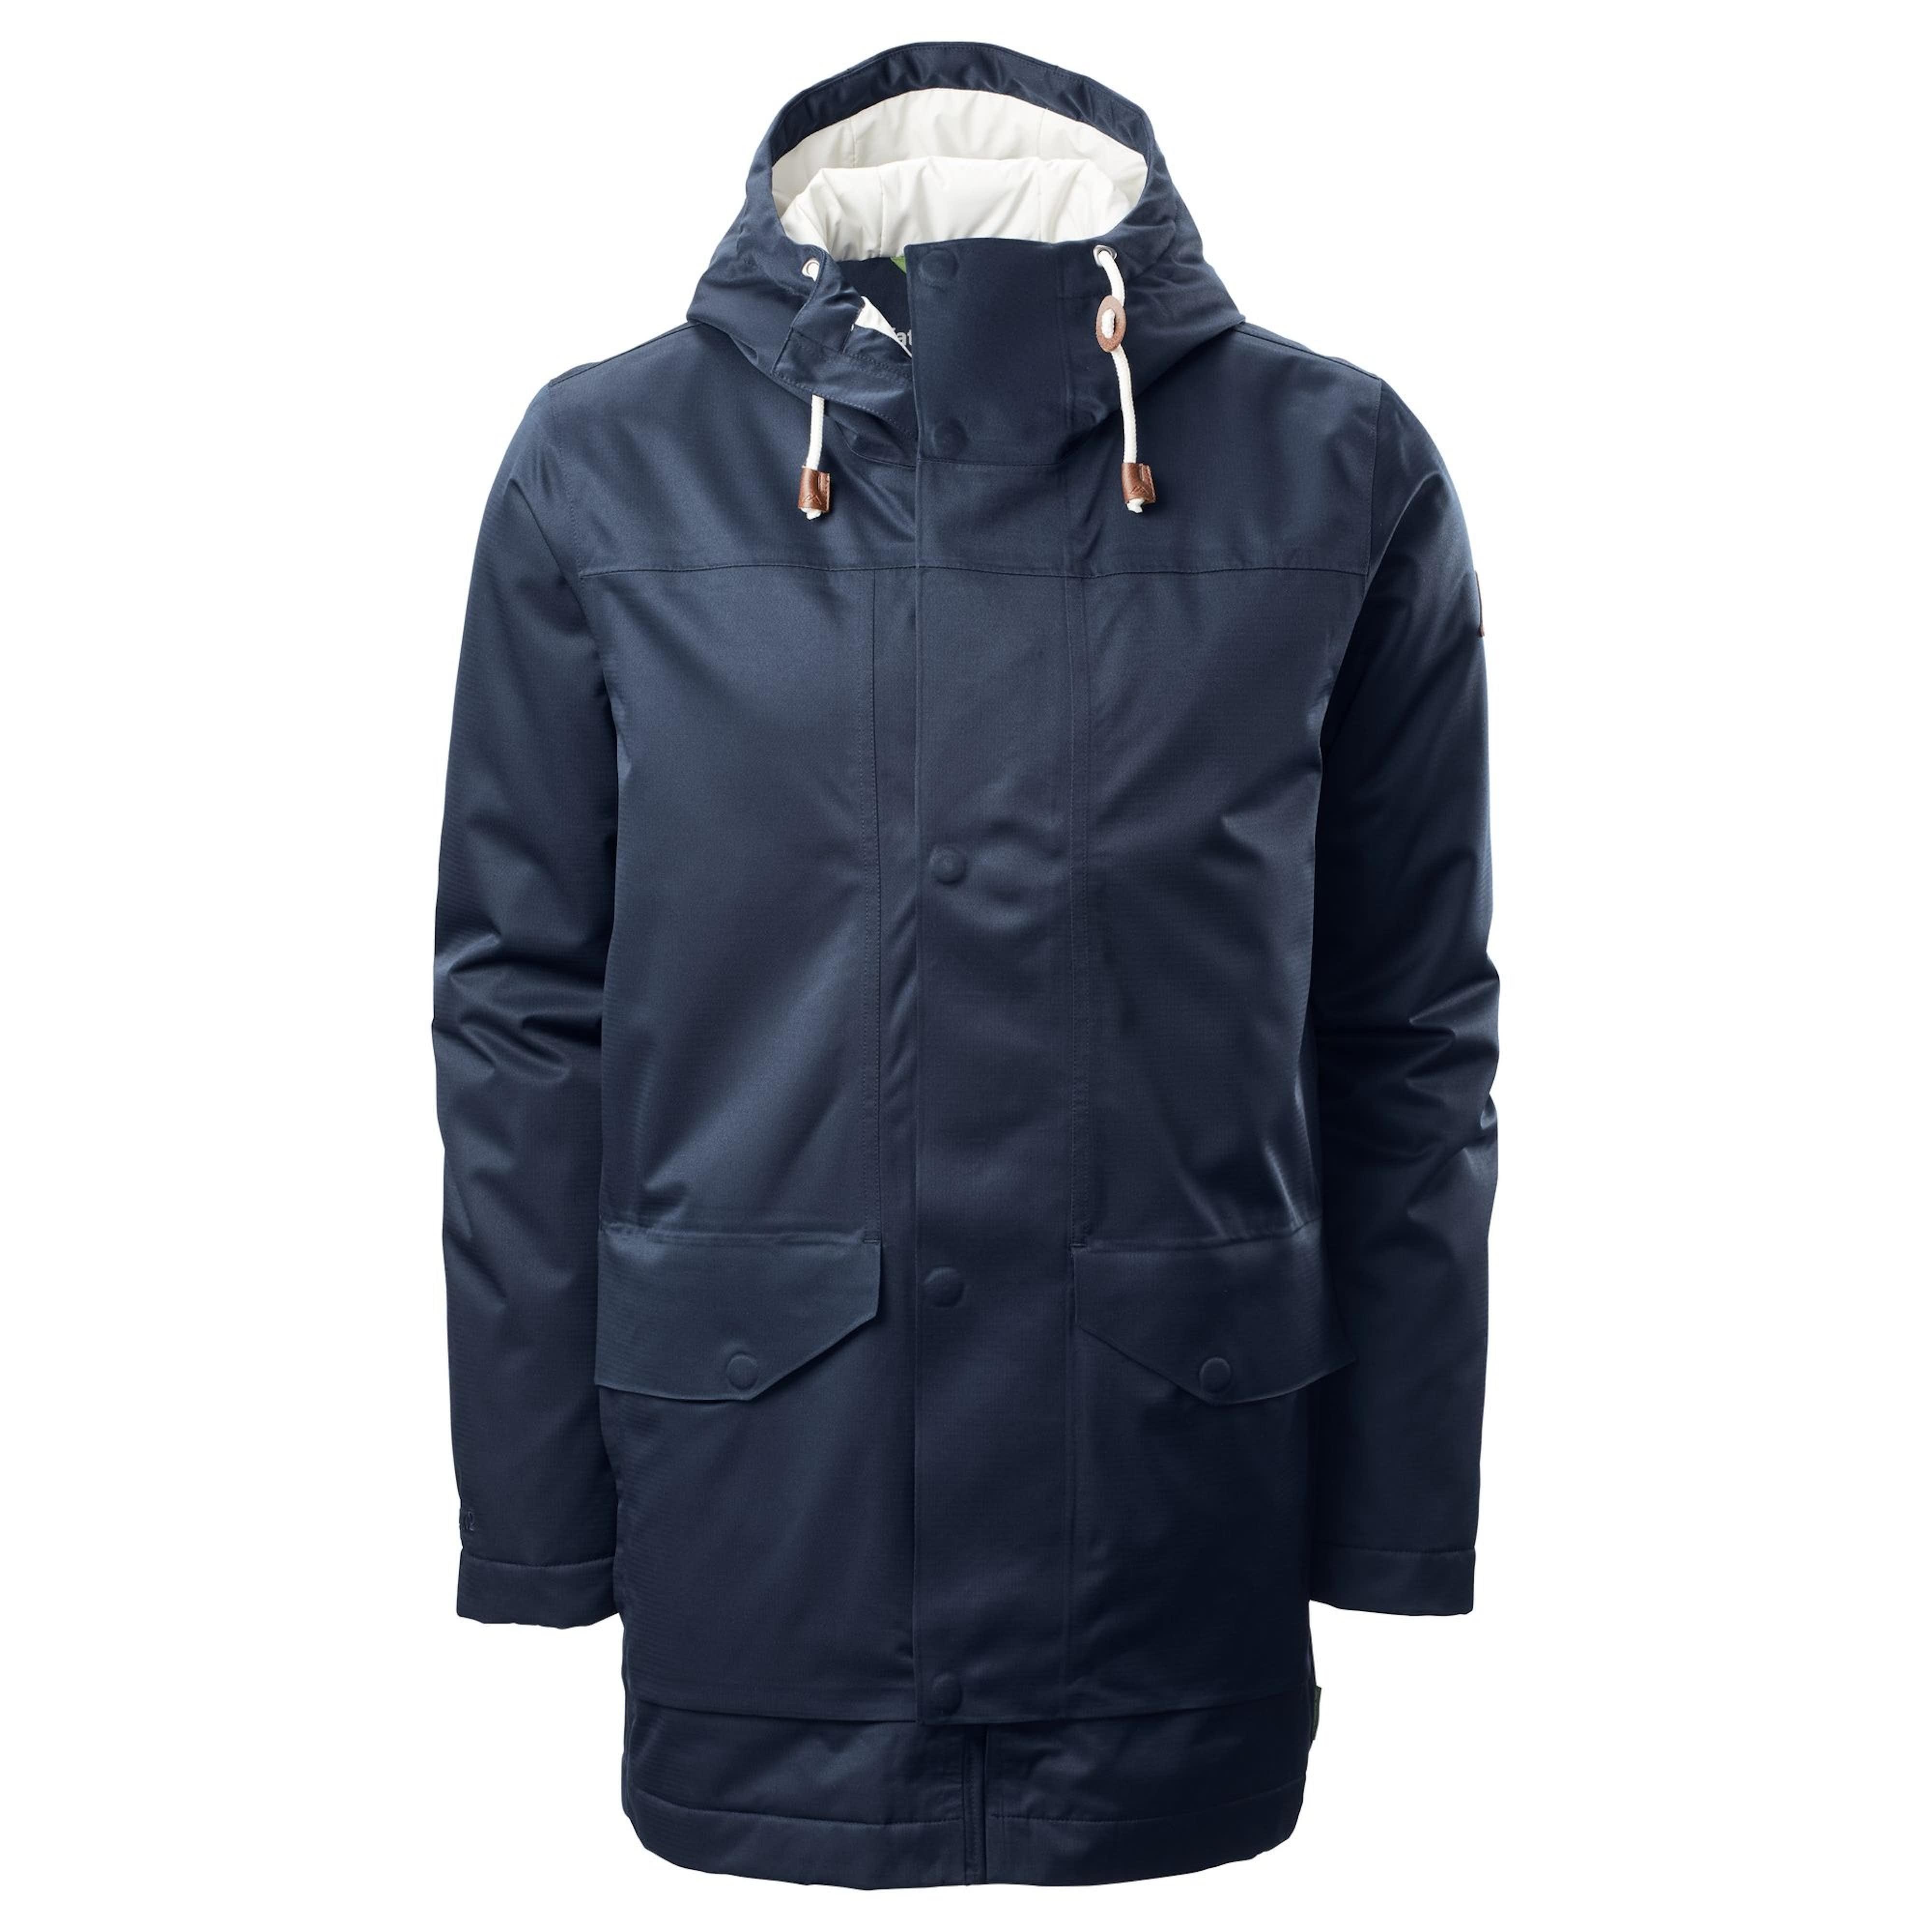 115504d96fdf8 Men's Rain Jackets & Raincoats   Waterproof & Lightweight   AU